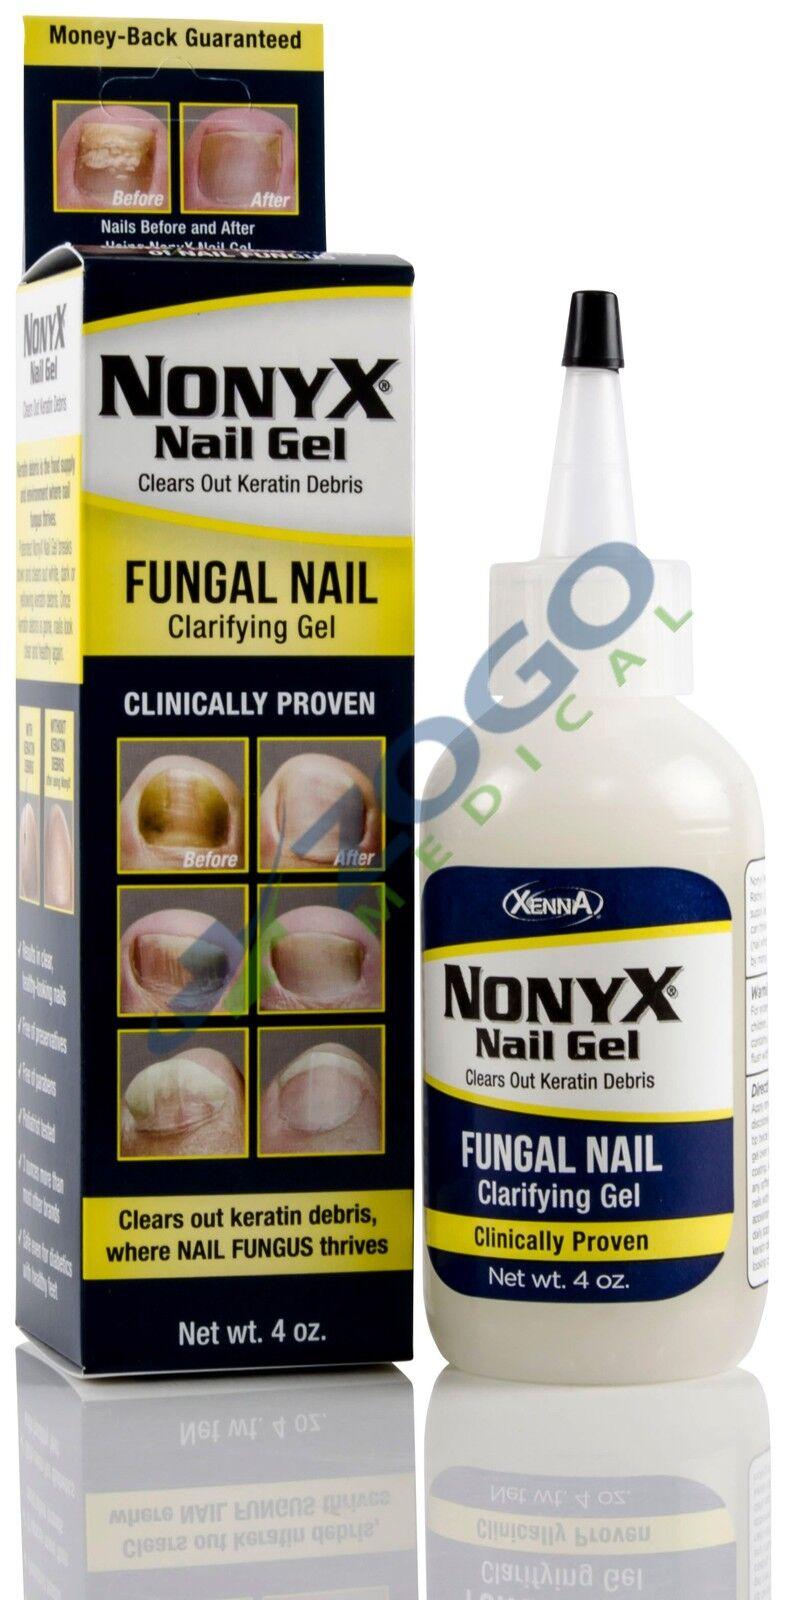 Xenna 101 NonyX Nail Gel 4 oz 812634001014   eBay